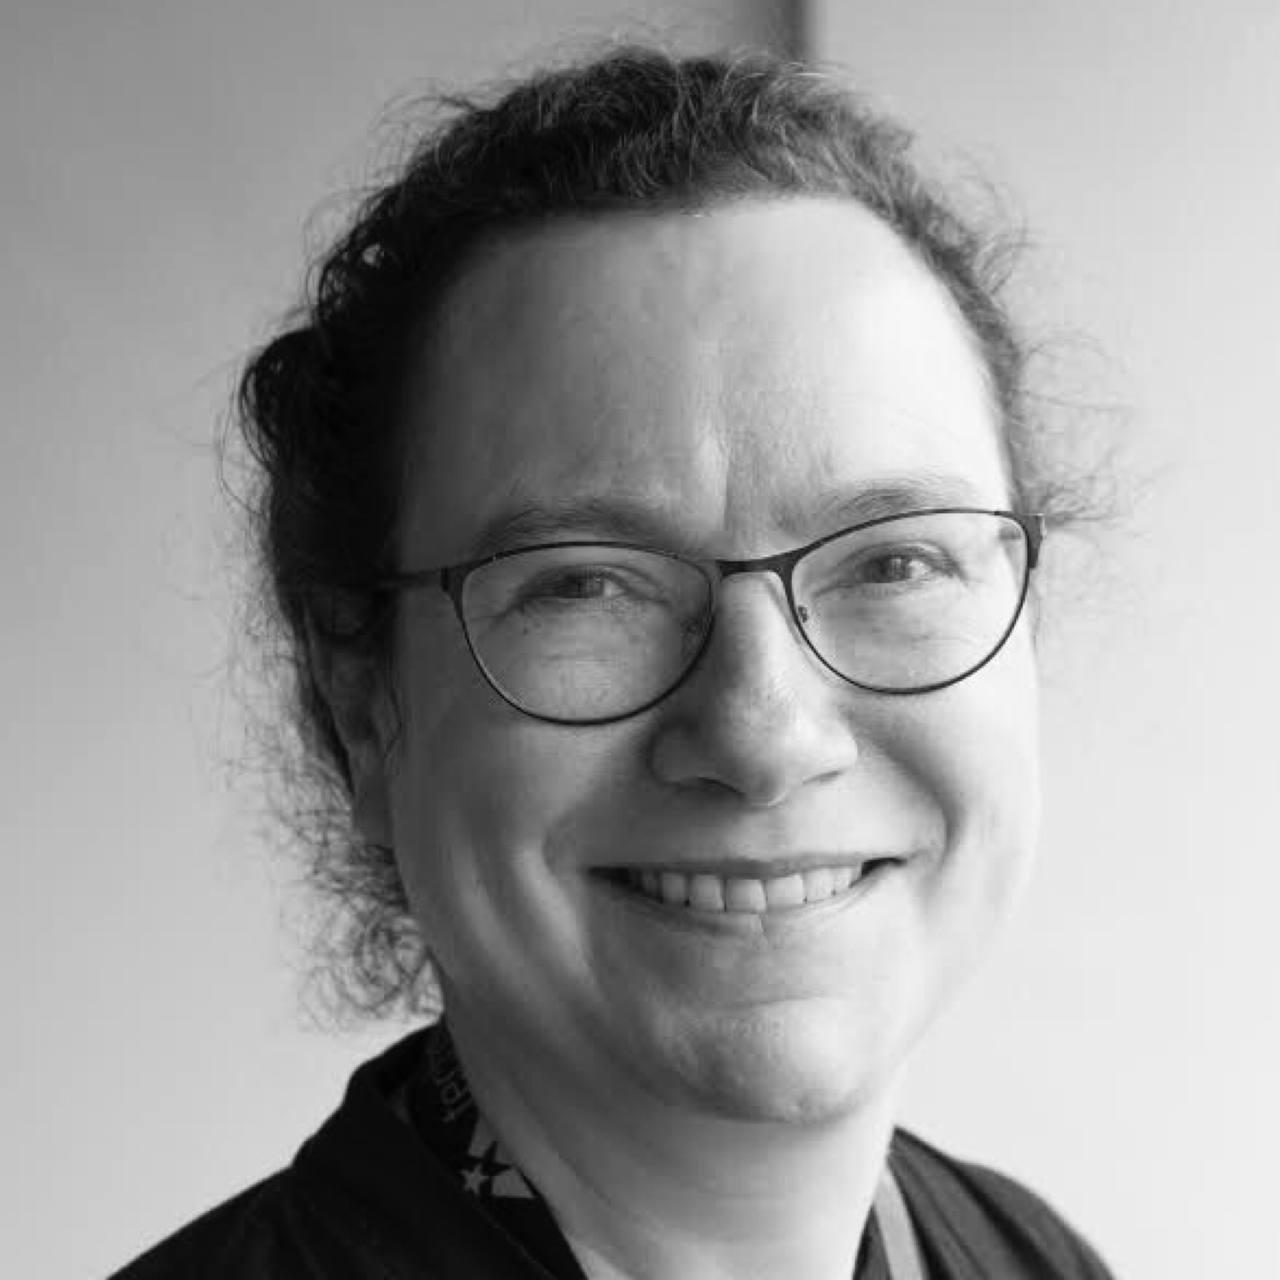 Sofie Blakstad